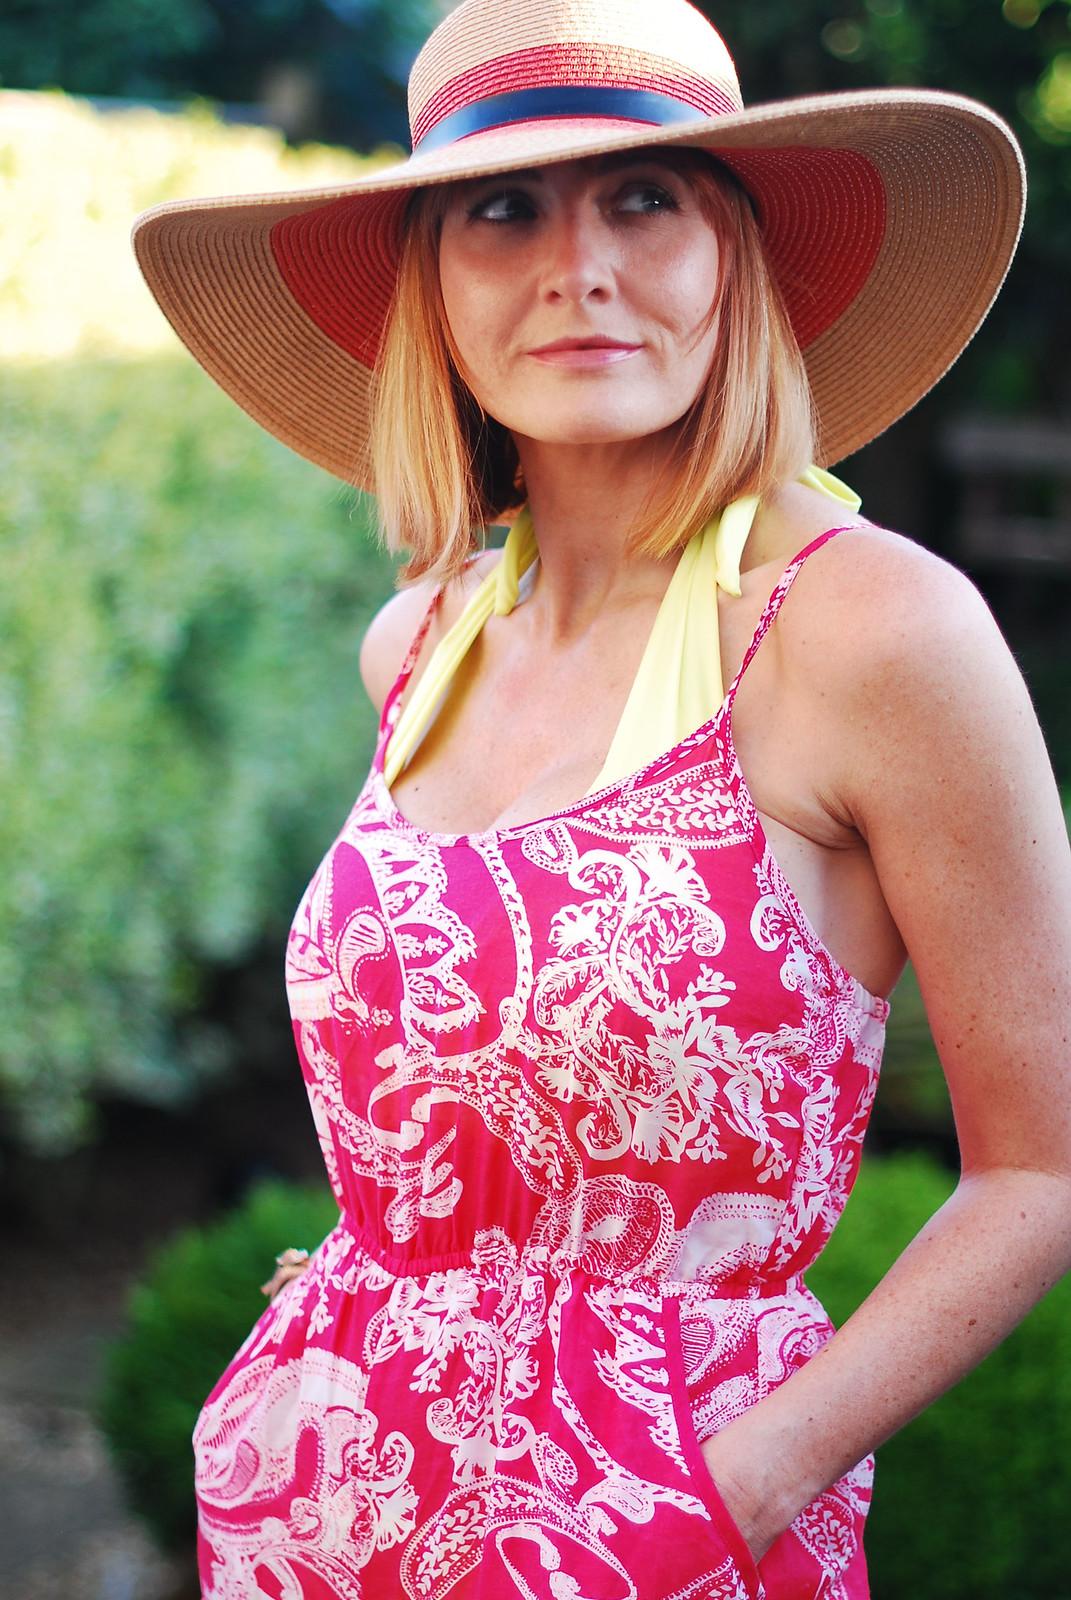 Over 40 style: Yellow bikini, paisley print wide leg beach jumpsuit, floppy sun hat | Not Dressed As Lamb